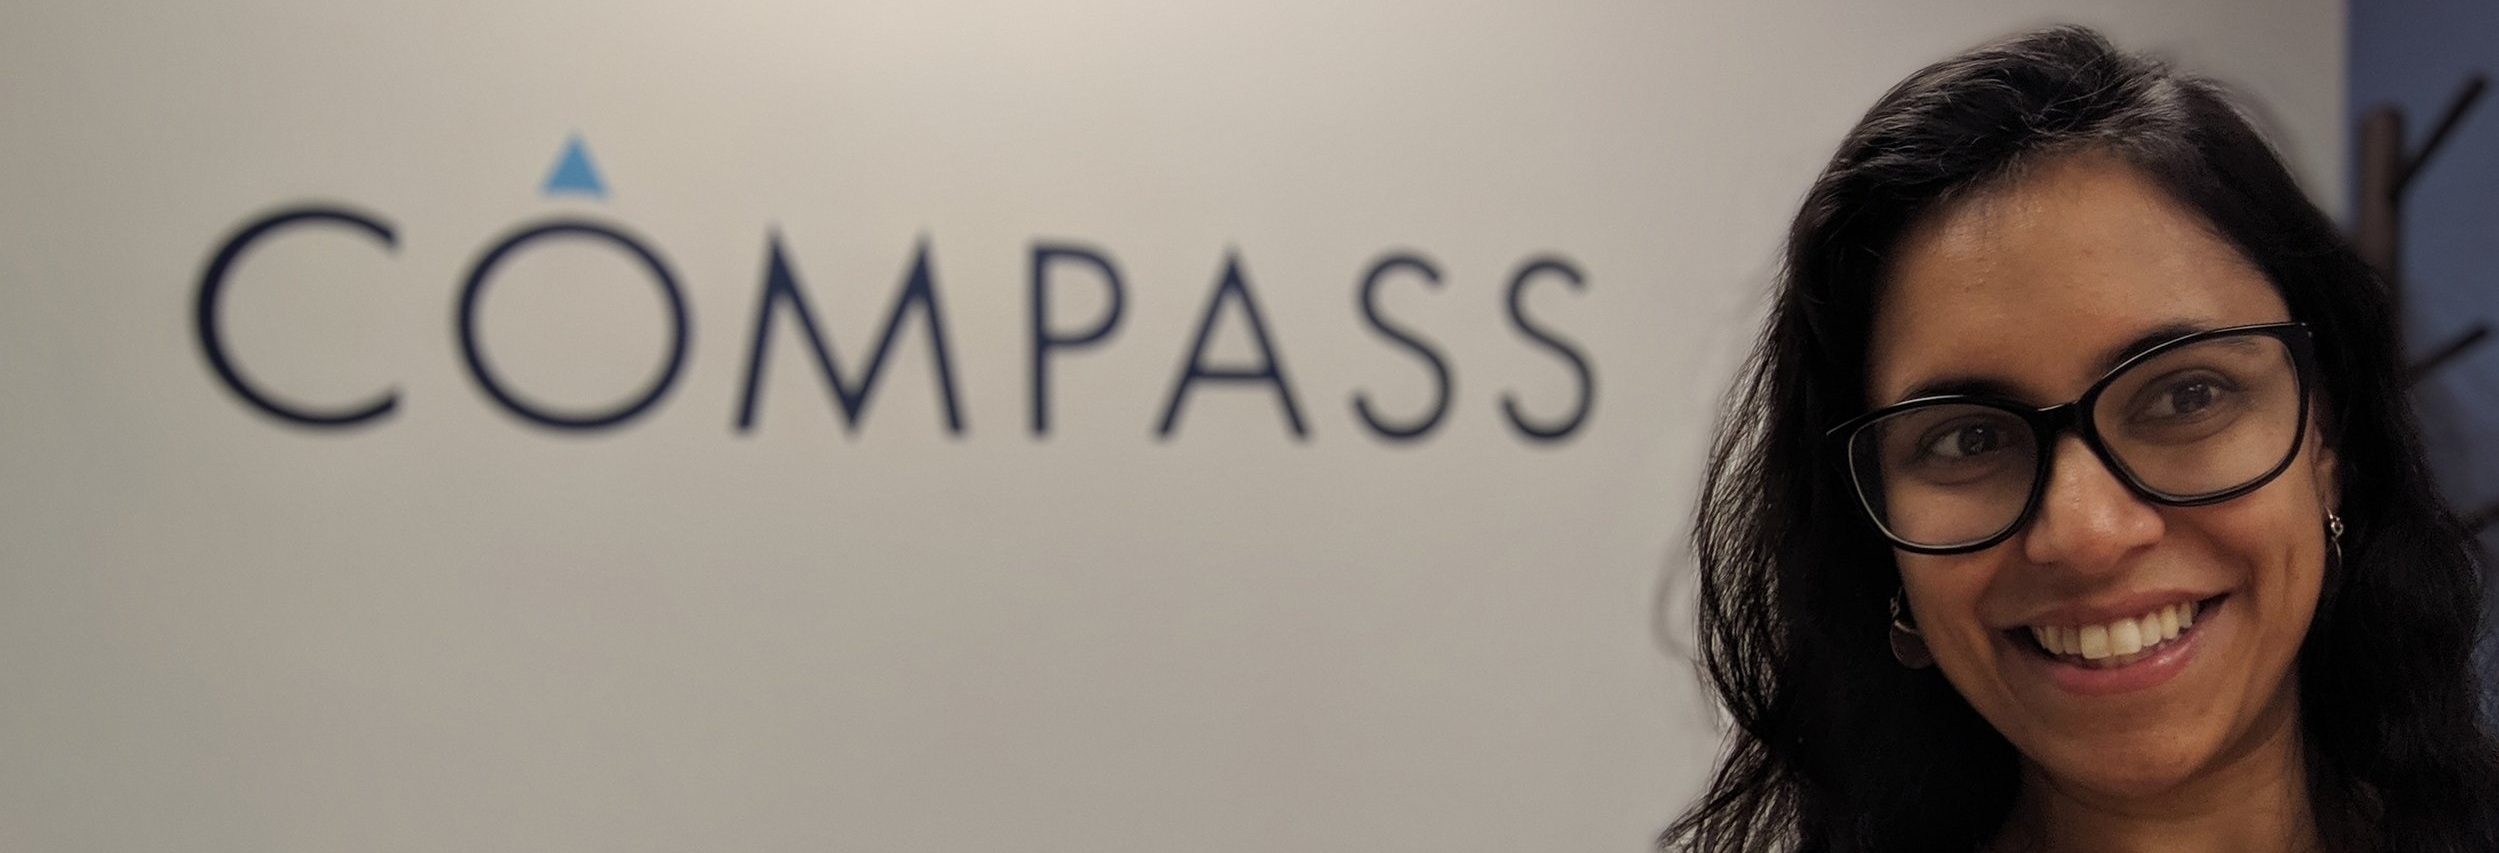 PShukla_COMPASS_2.jpg